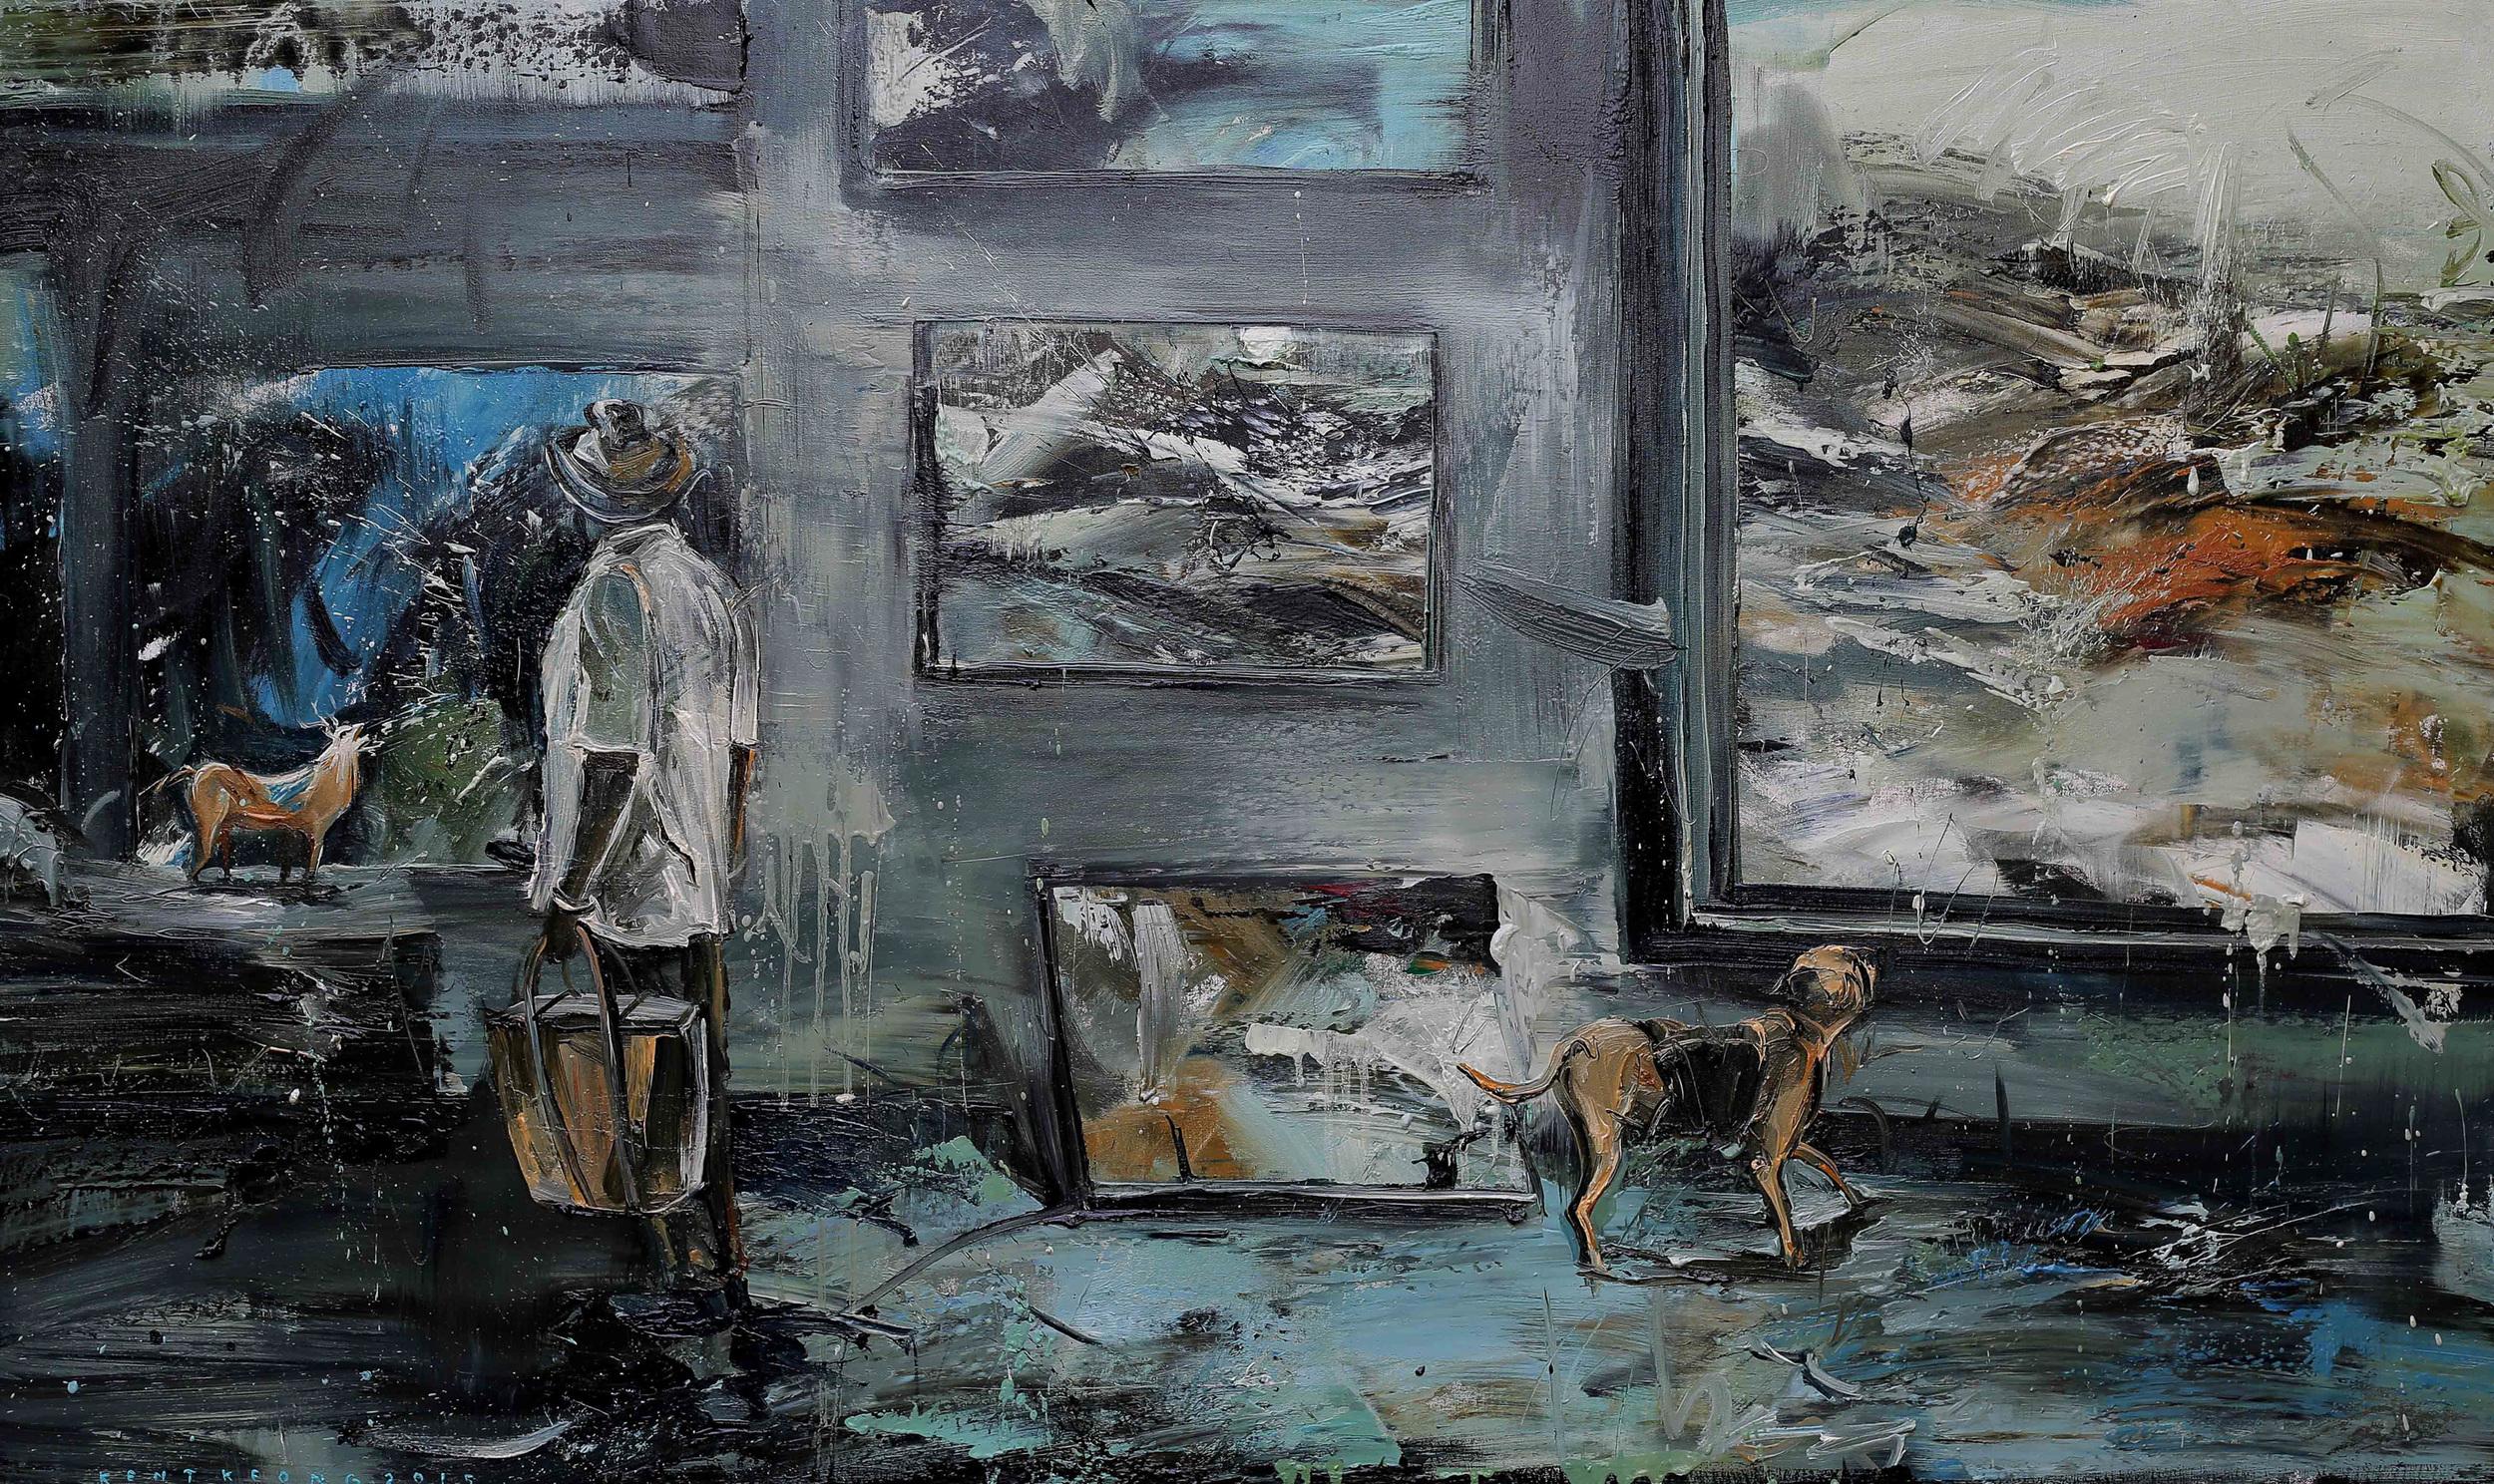 The Collector |美術館, 2015, 97 x 162 cm